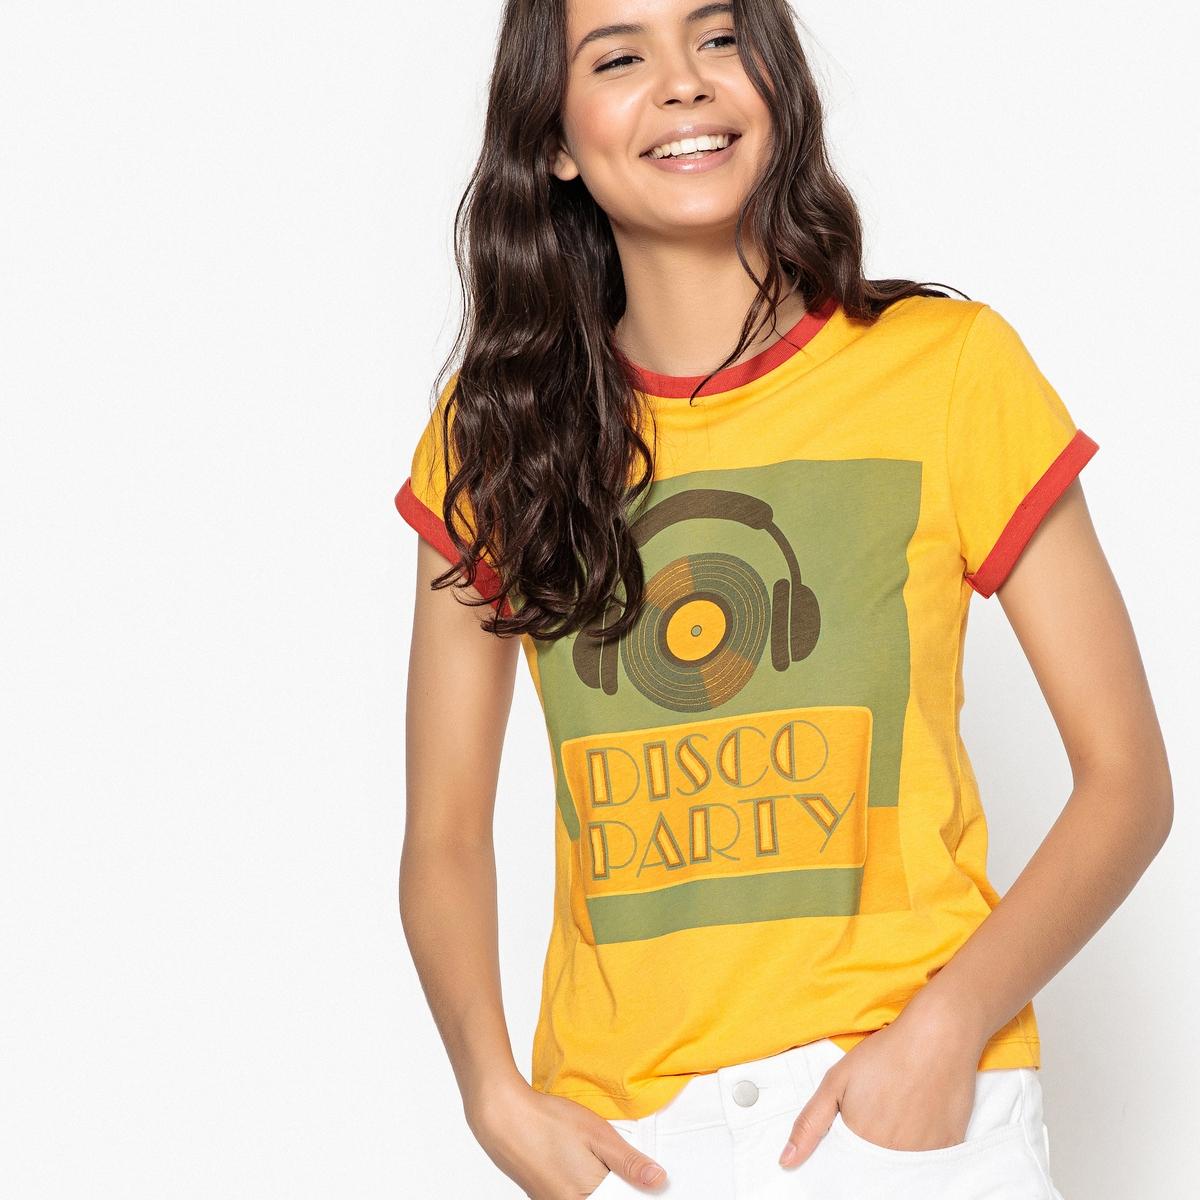 Футболка с круглым вырезом, короткими рукавами и рисунком спереди футболка с круглым вырезом рисунком и короткими рукавами